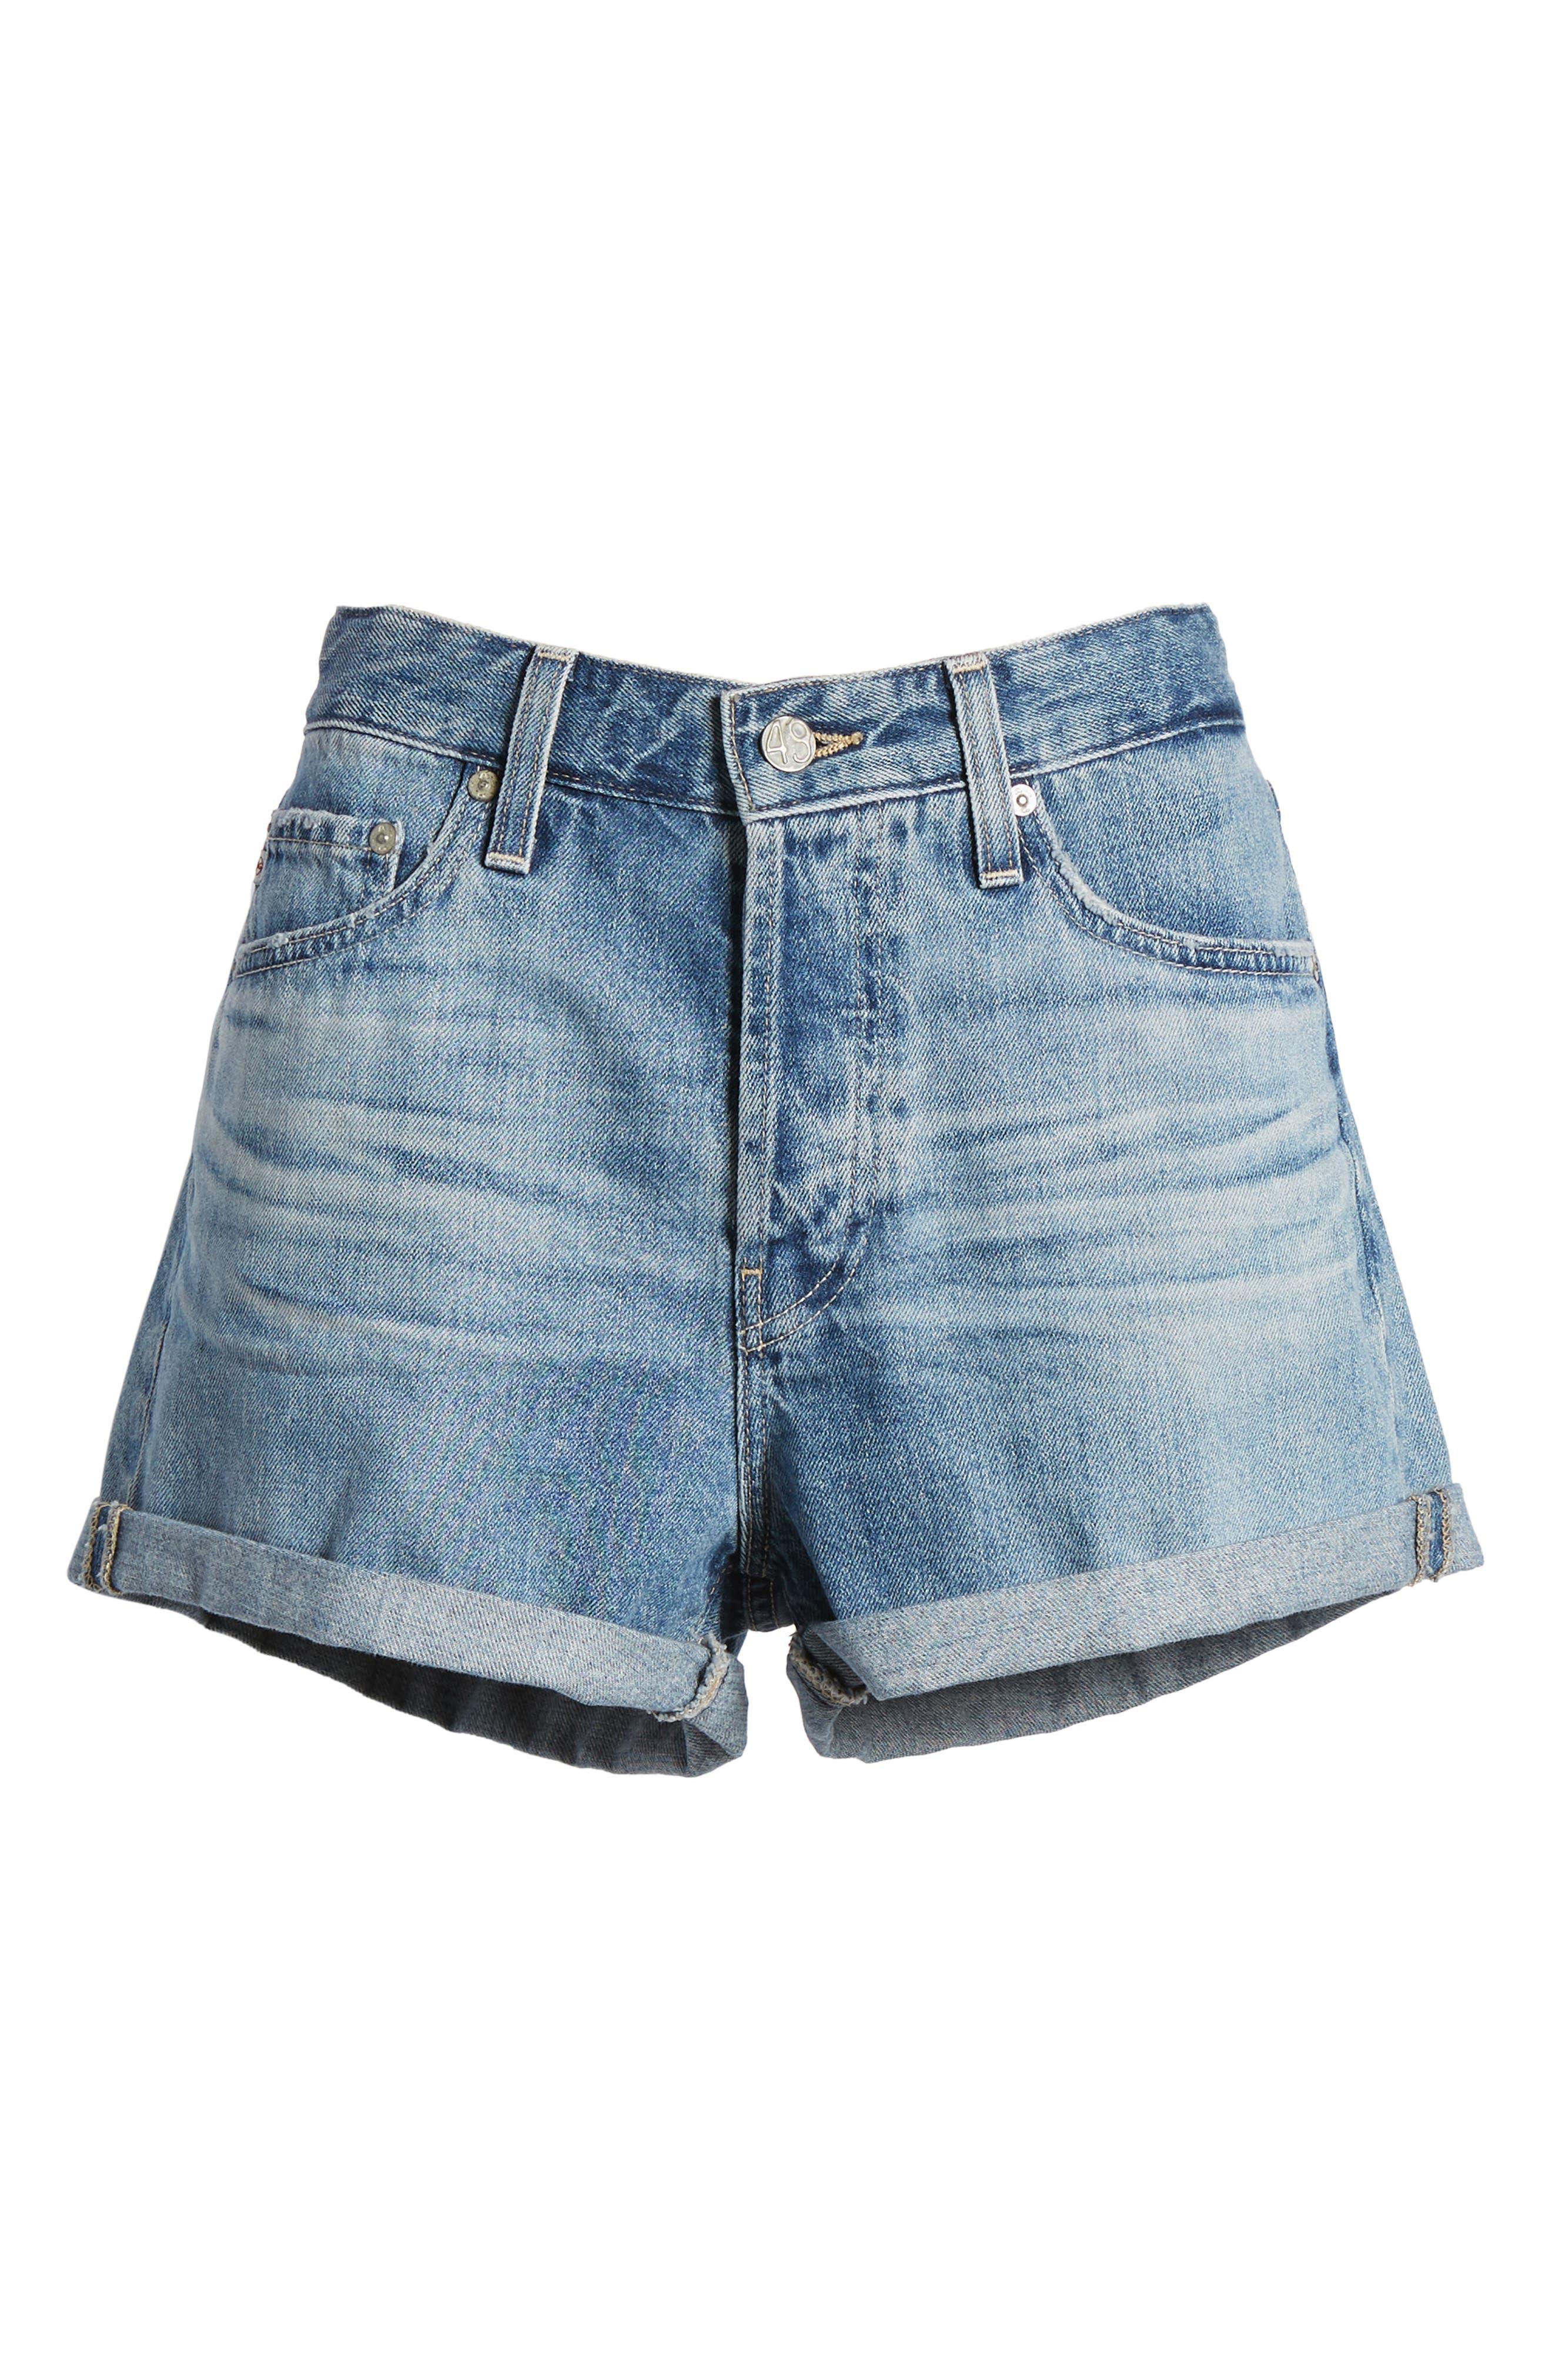 Alex Cuff Denim Boyfriend Shorts,                             Alternate thumbnail 7, color,                             493